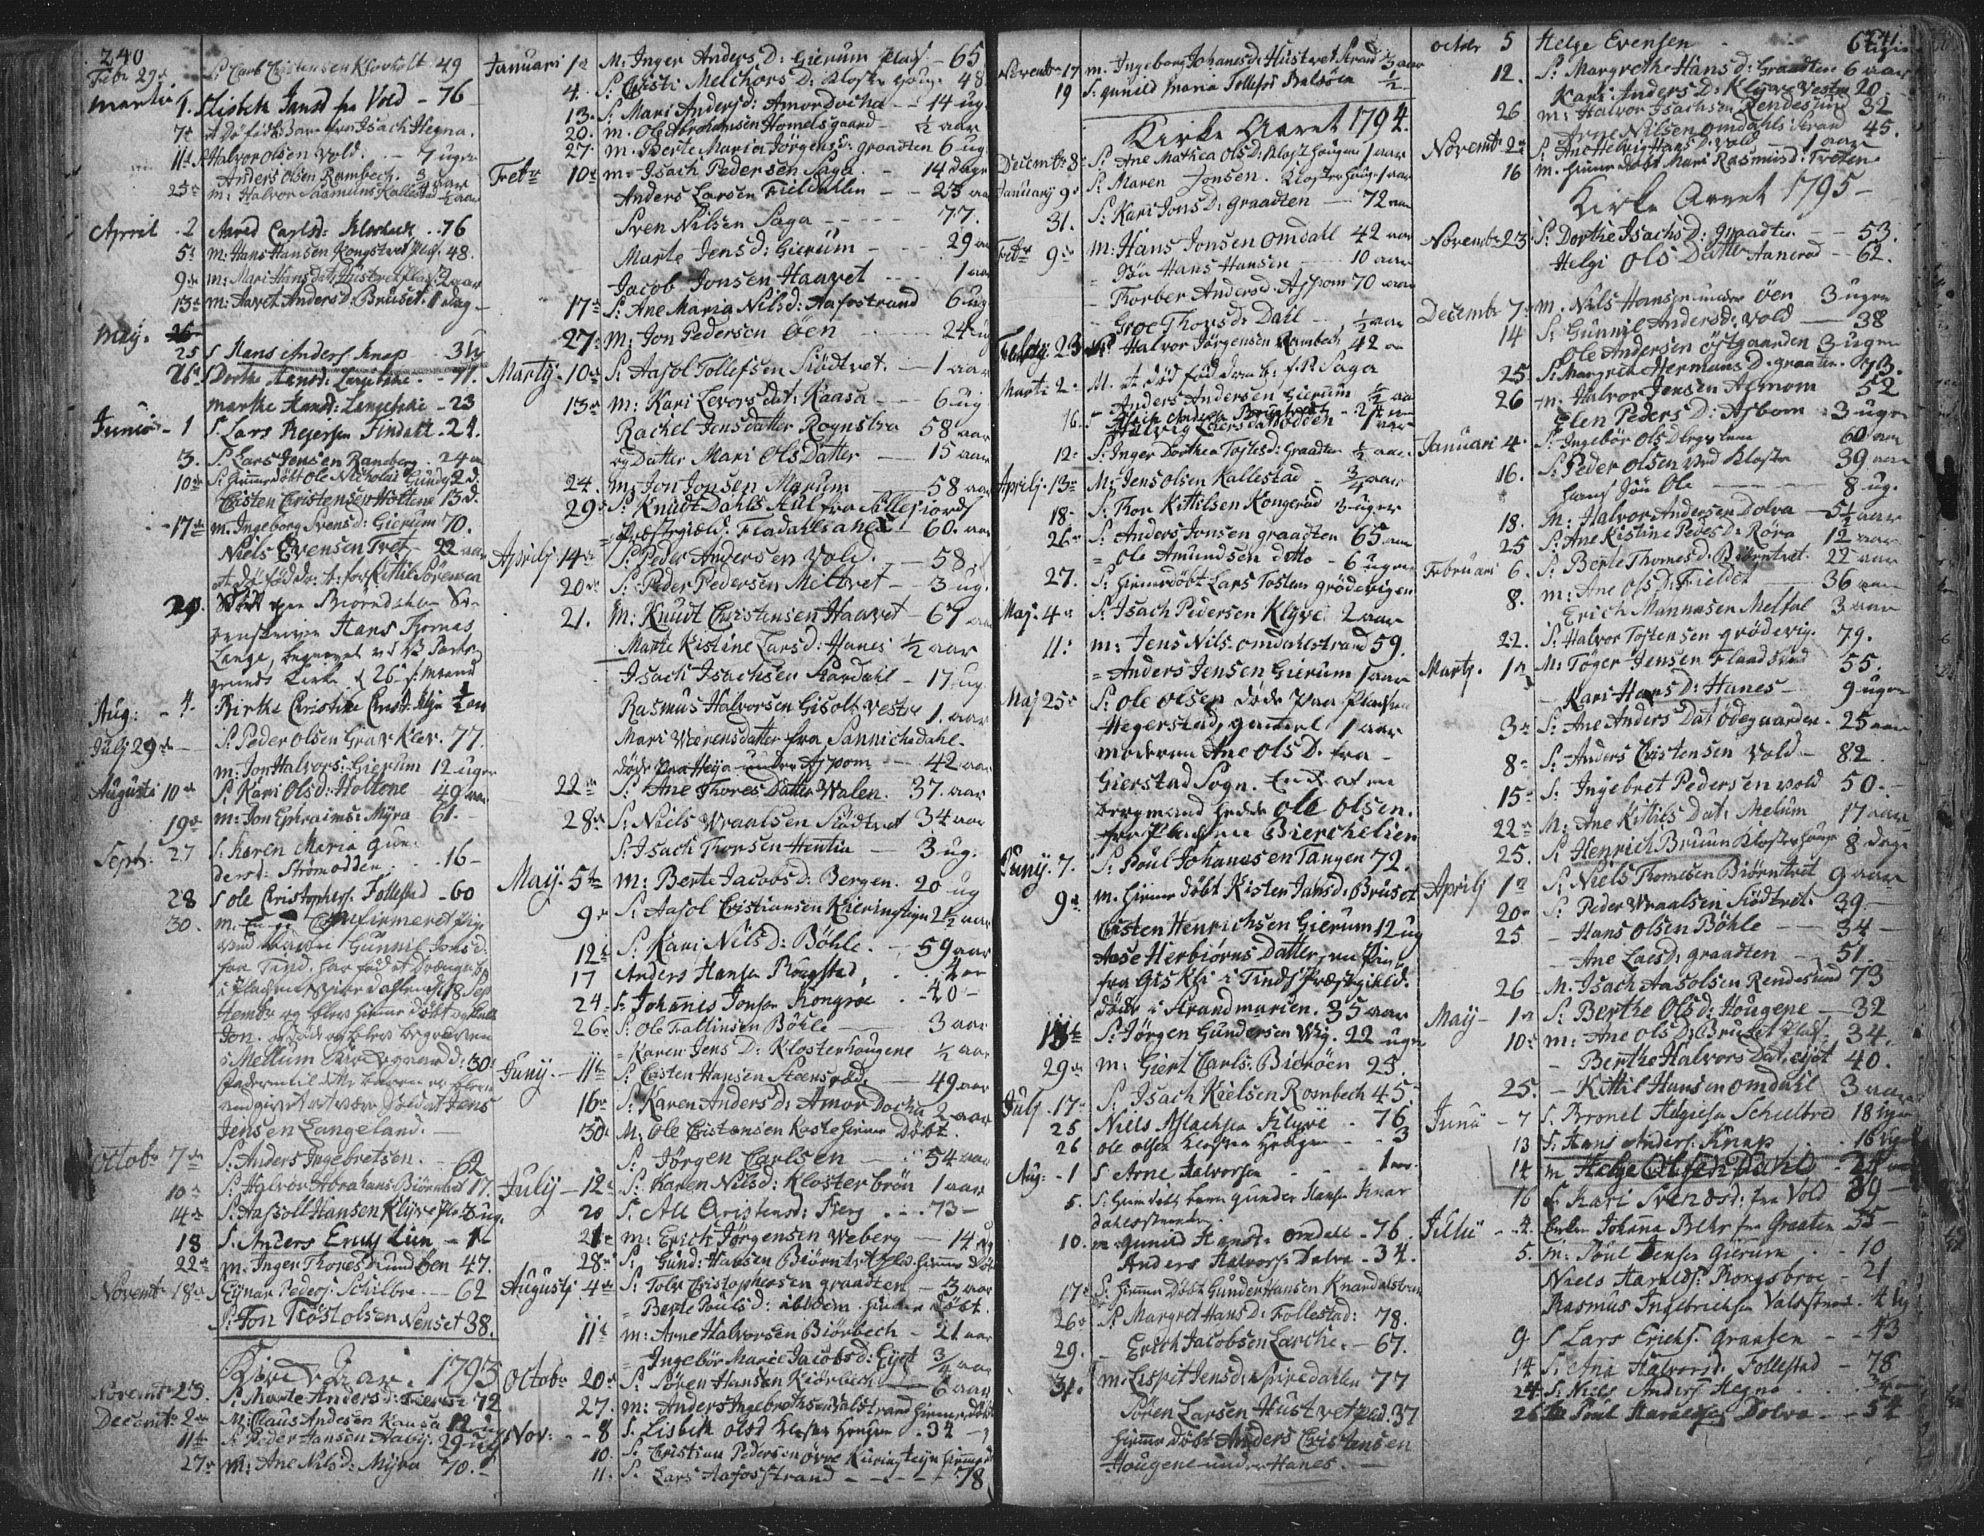 SAKO, Solum kirkebøker, F/Fa/L0003: Ministerialbok nr. I 3, 1761-1814, s. 240-241